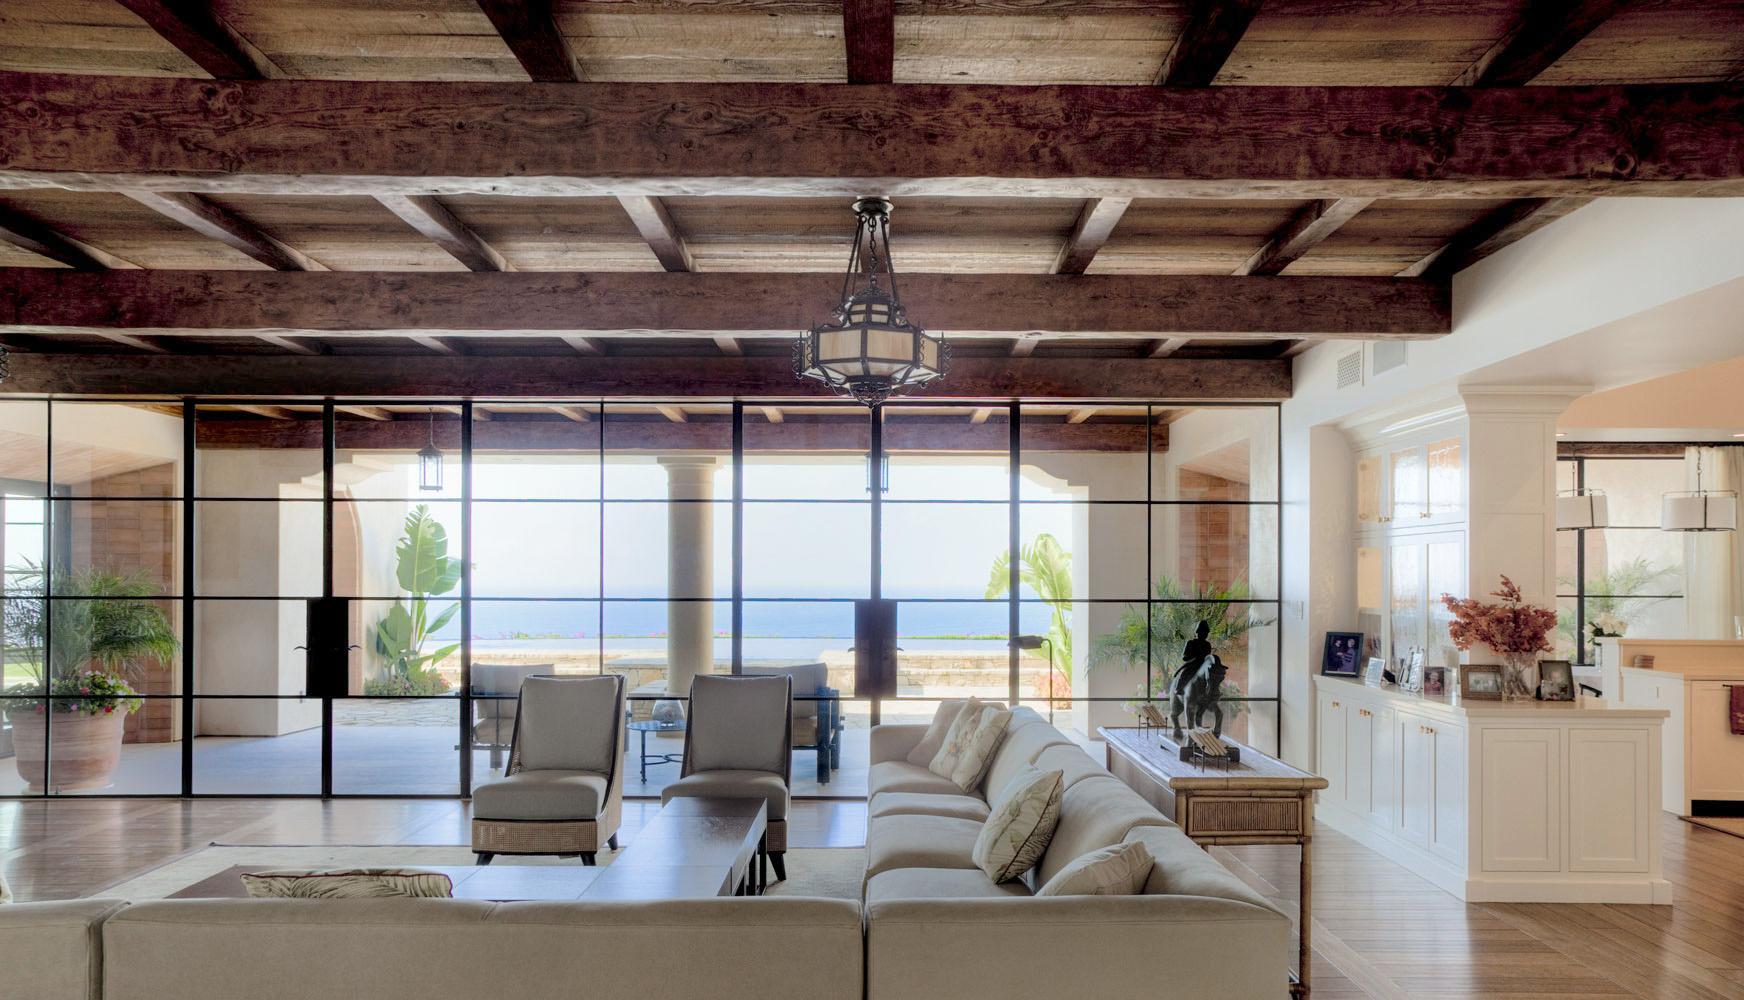 Contemporary-Spanish-Living-Room-Built-in-Shelving-Floor-Ceiling-Windows-French-Doors-Corbin-Reeves.jpg